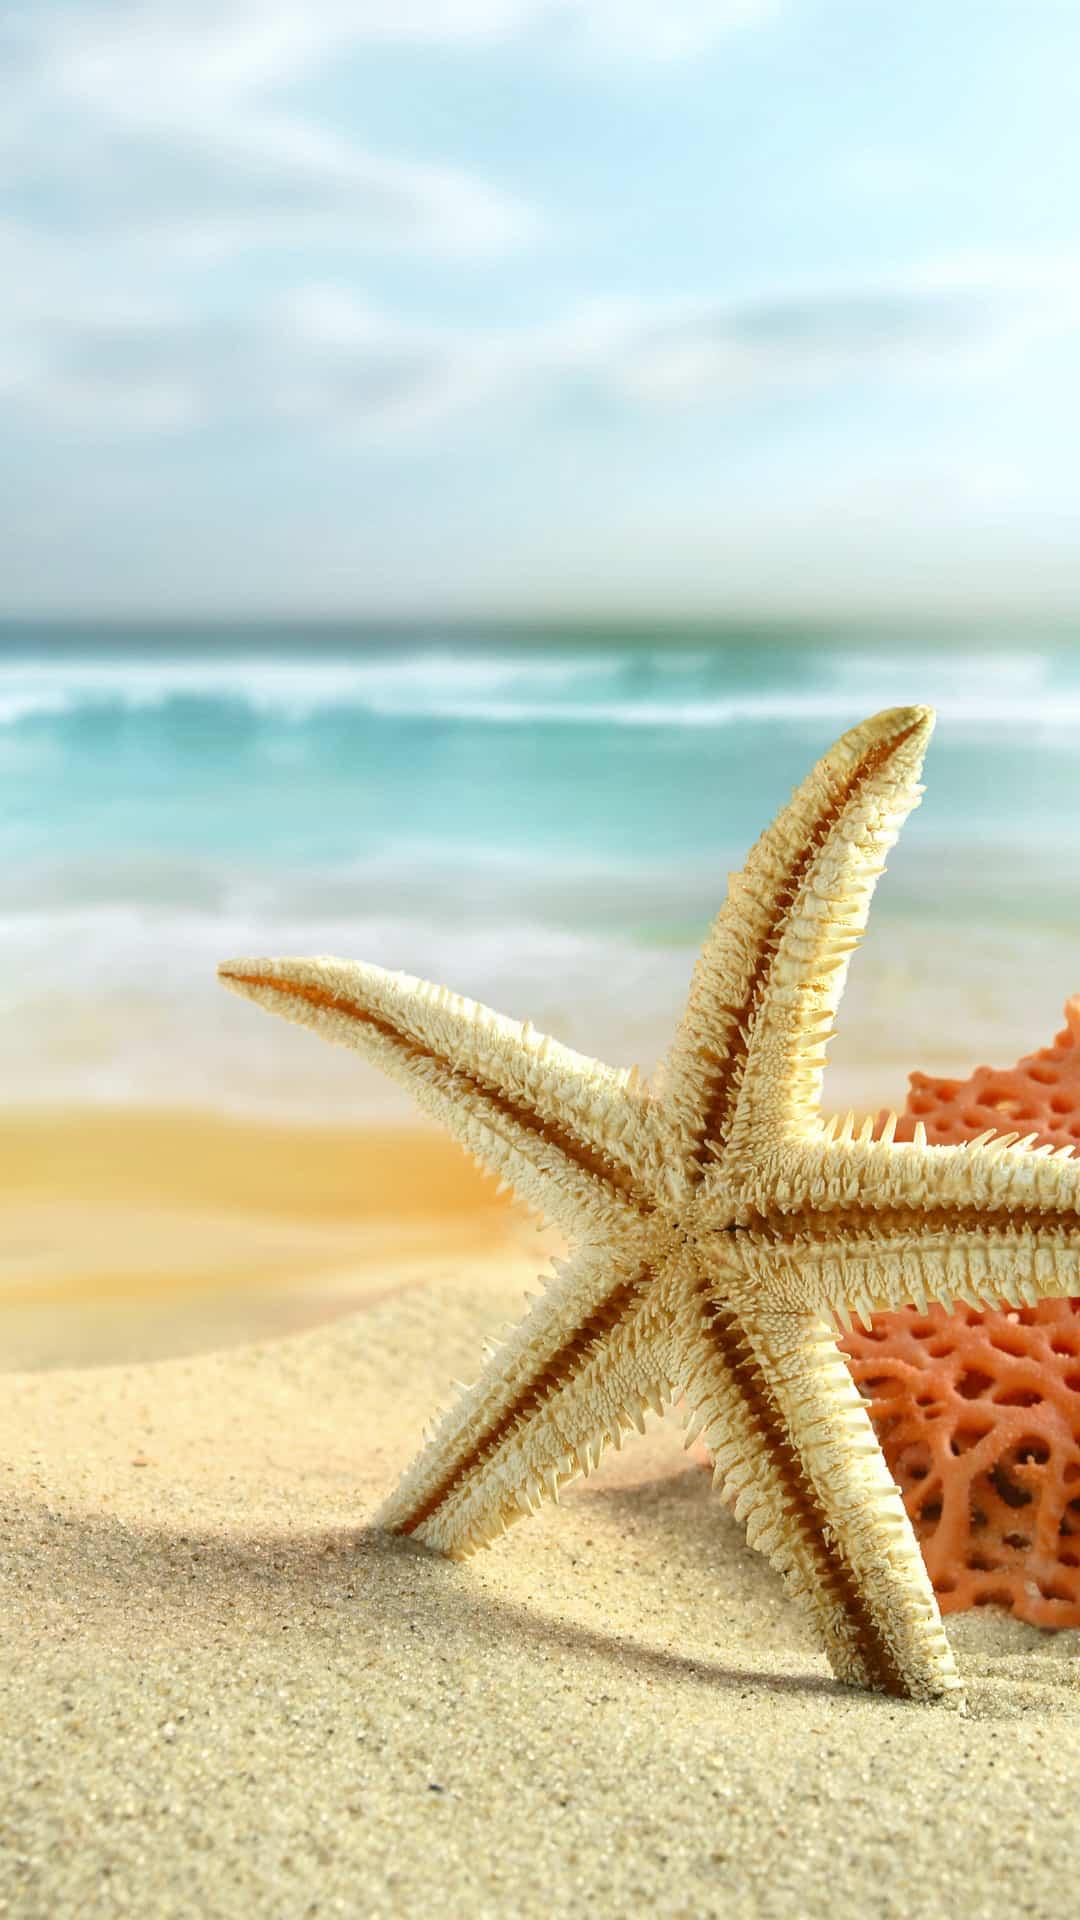 Sea Star Summer Beach Android Wallpaper